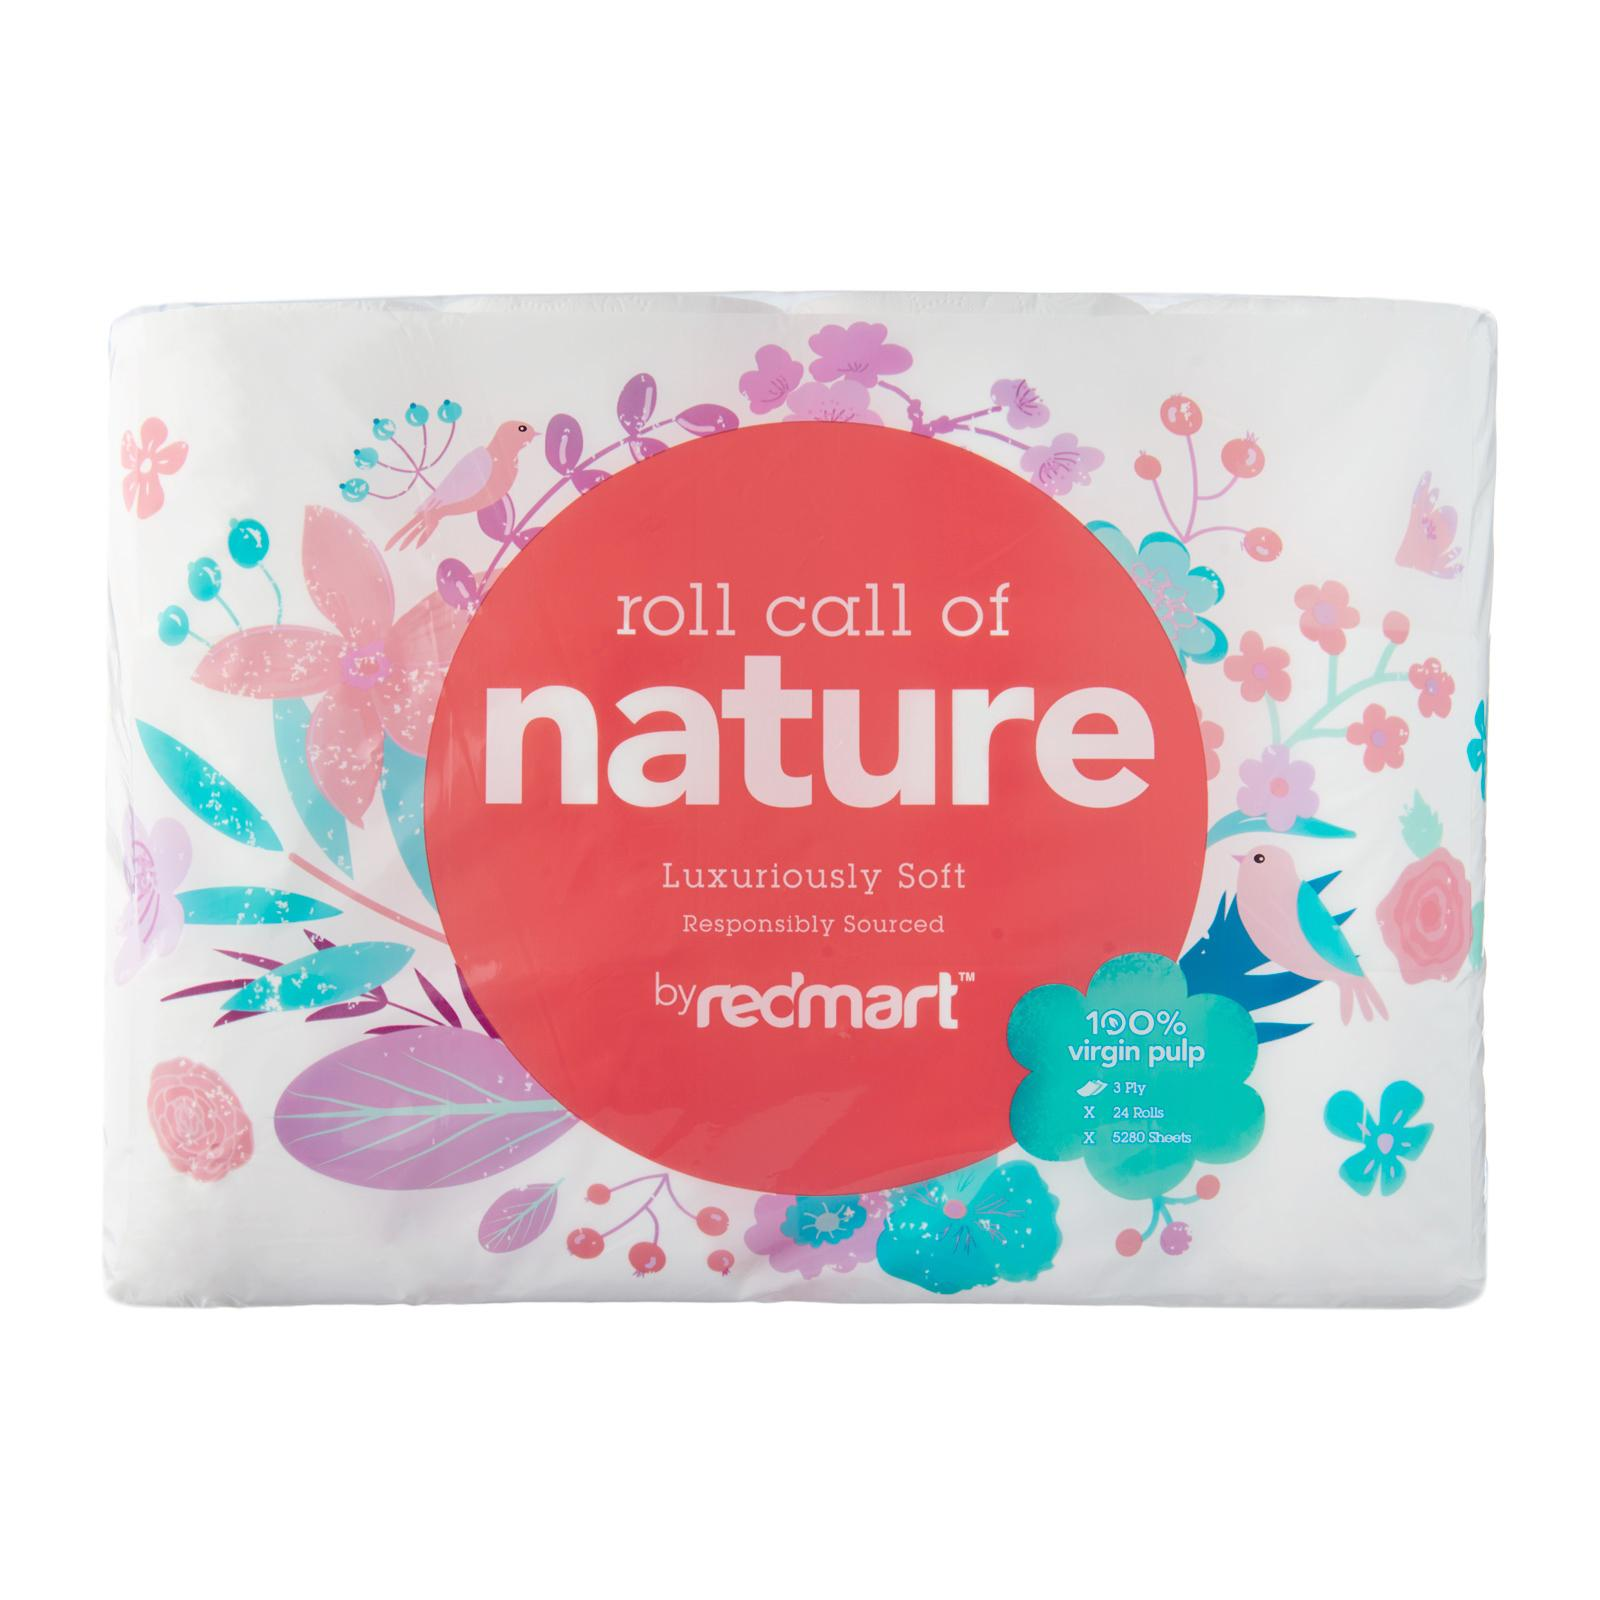 Redmart Luxuriously Soft 3-Ply Toilet Tissue - 24 Rolls By Redmart.